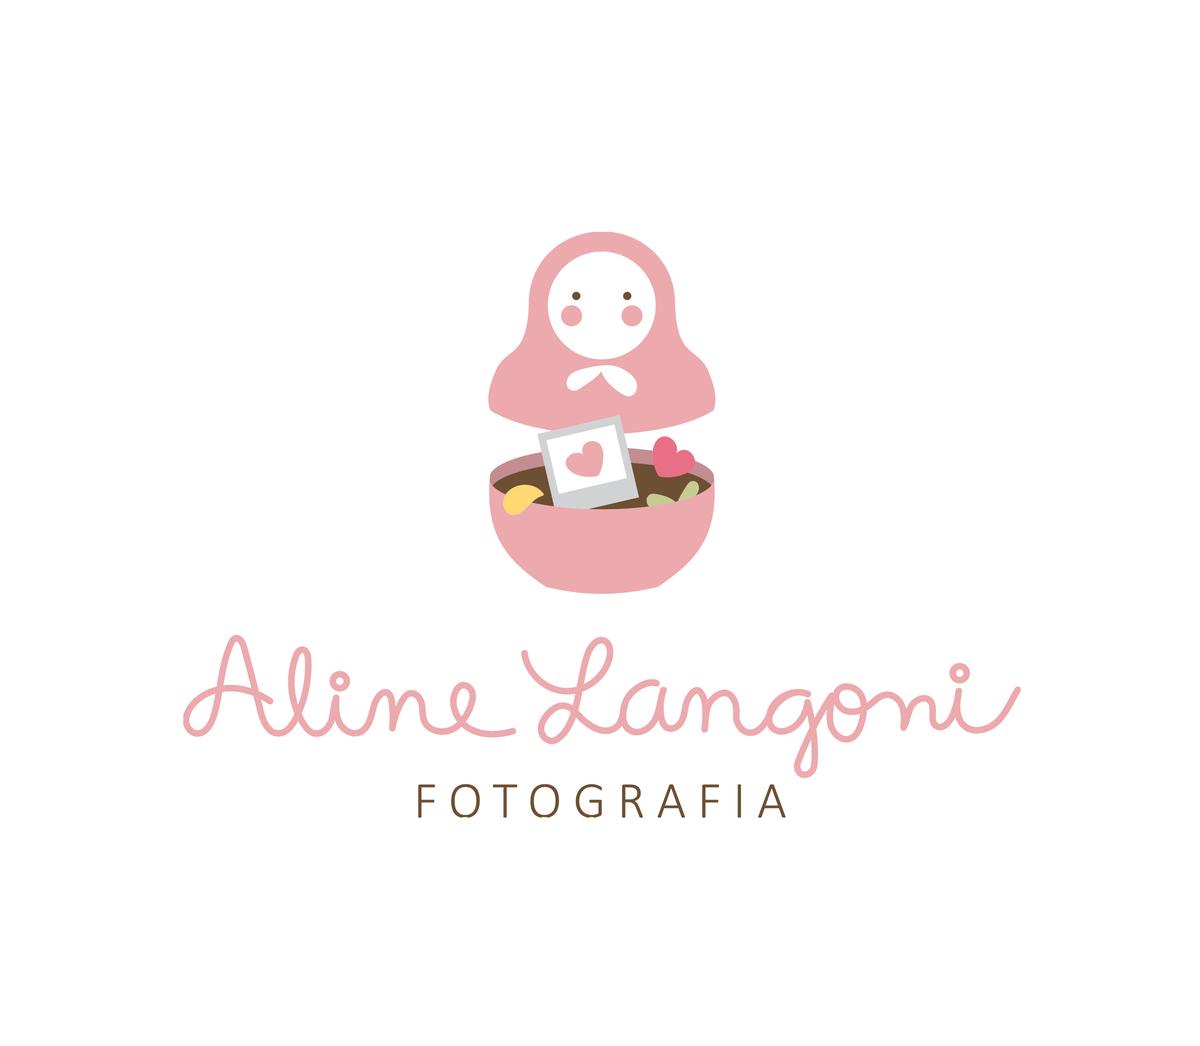 Imagem capa - Meu novo Logo: Matrioska, transbordando AMOR ! por Aline Langoni